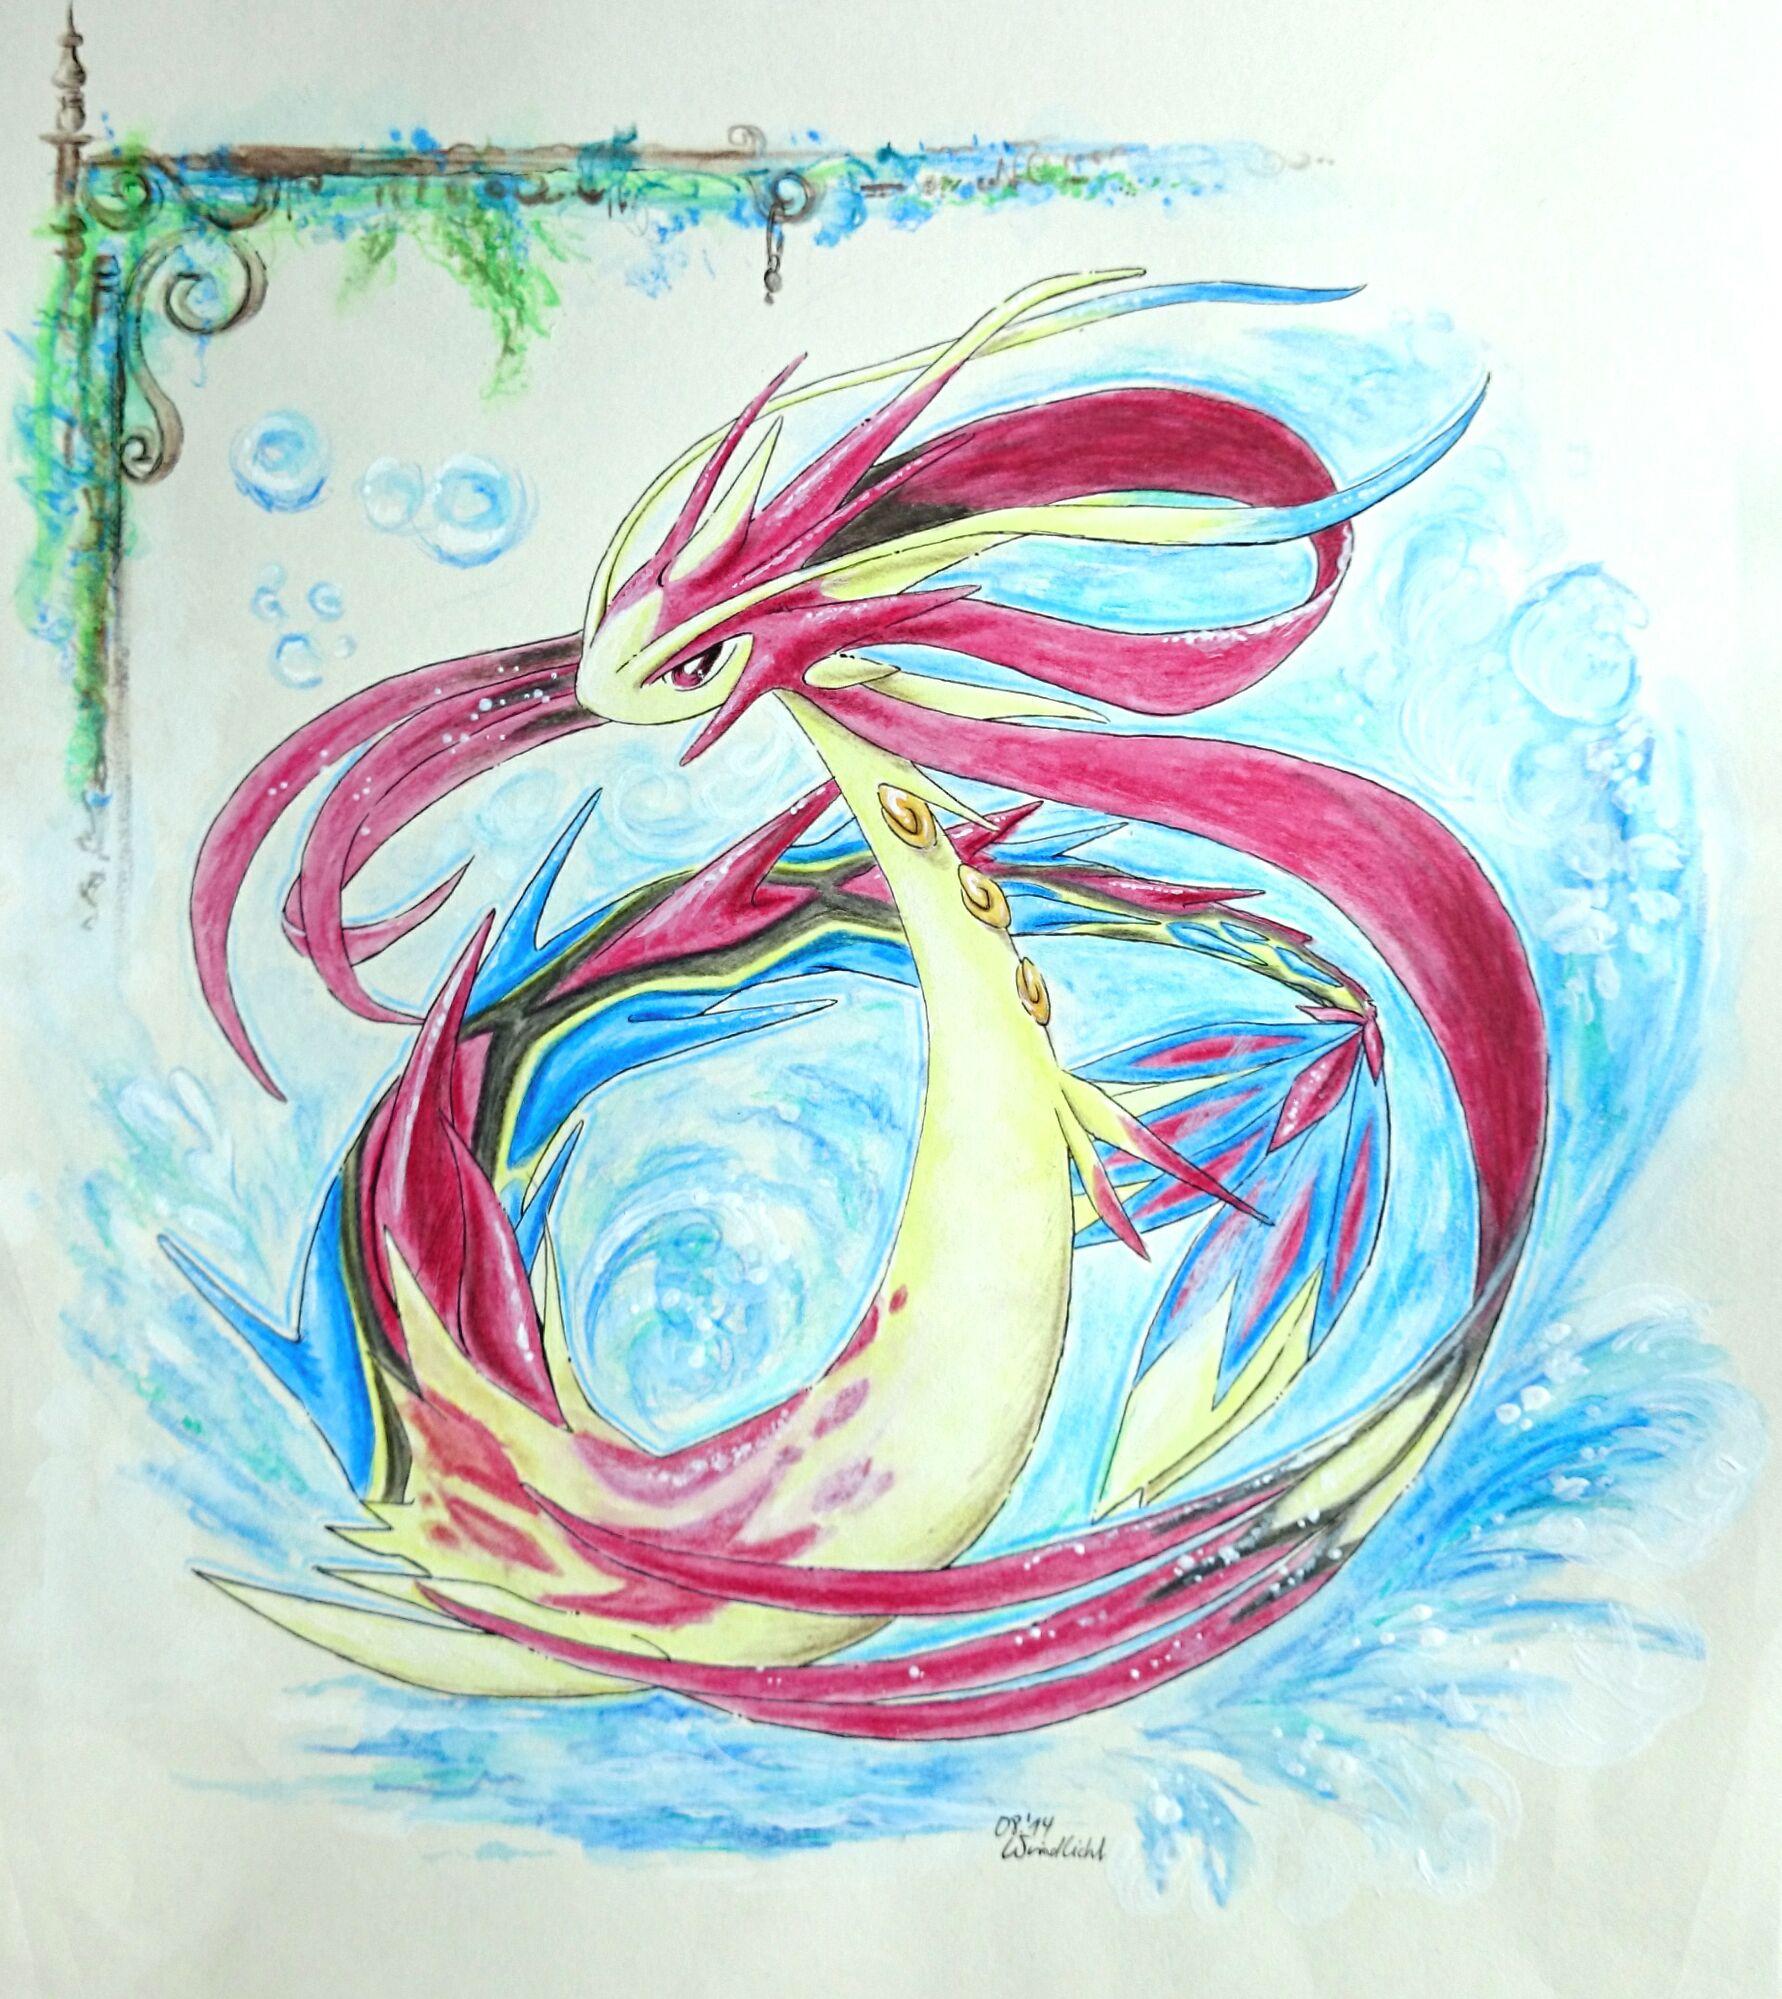 Pokémon-Zeichnung: Mega Milotic